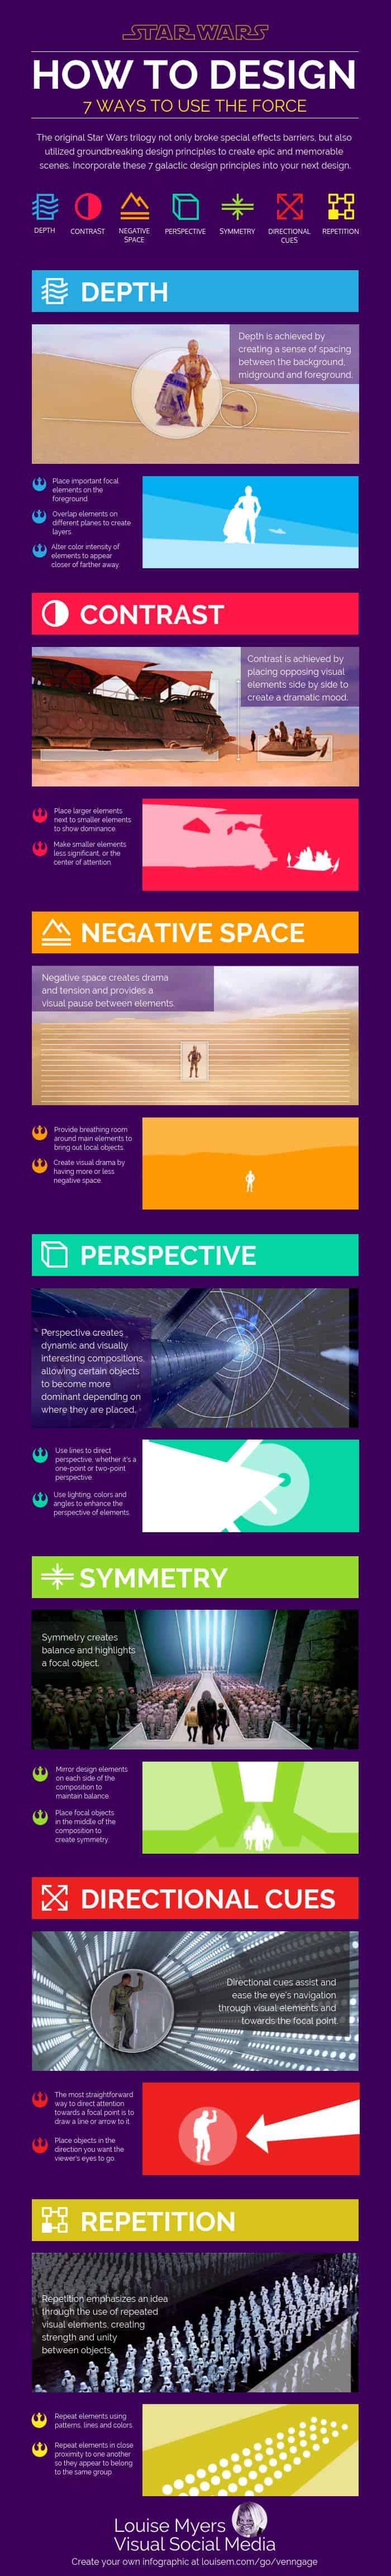 epic design principles infographic